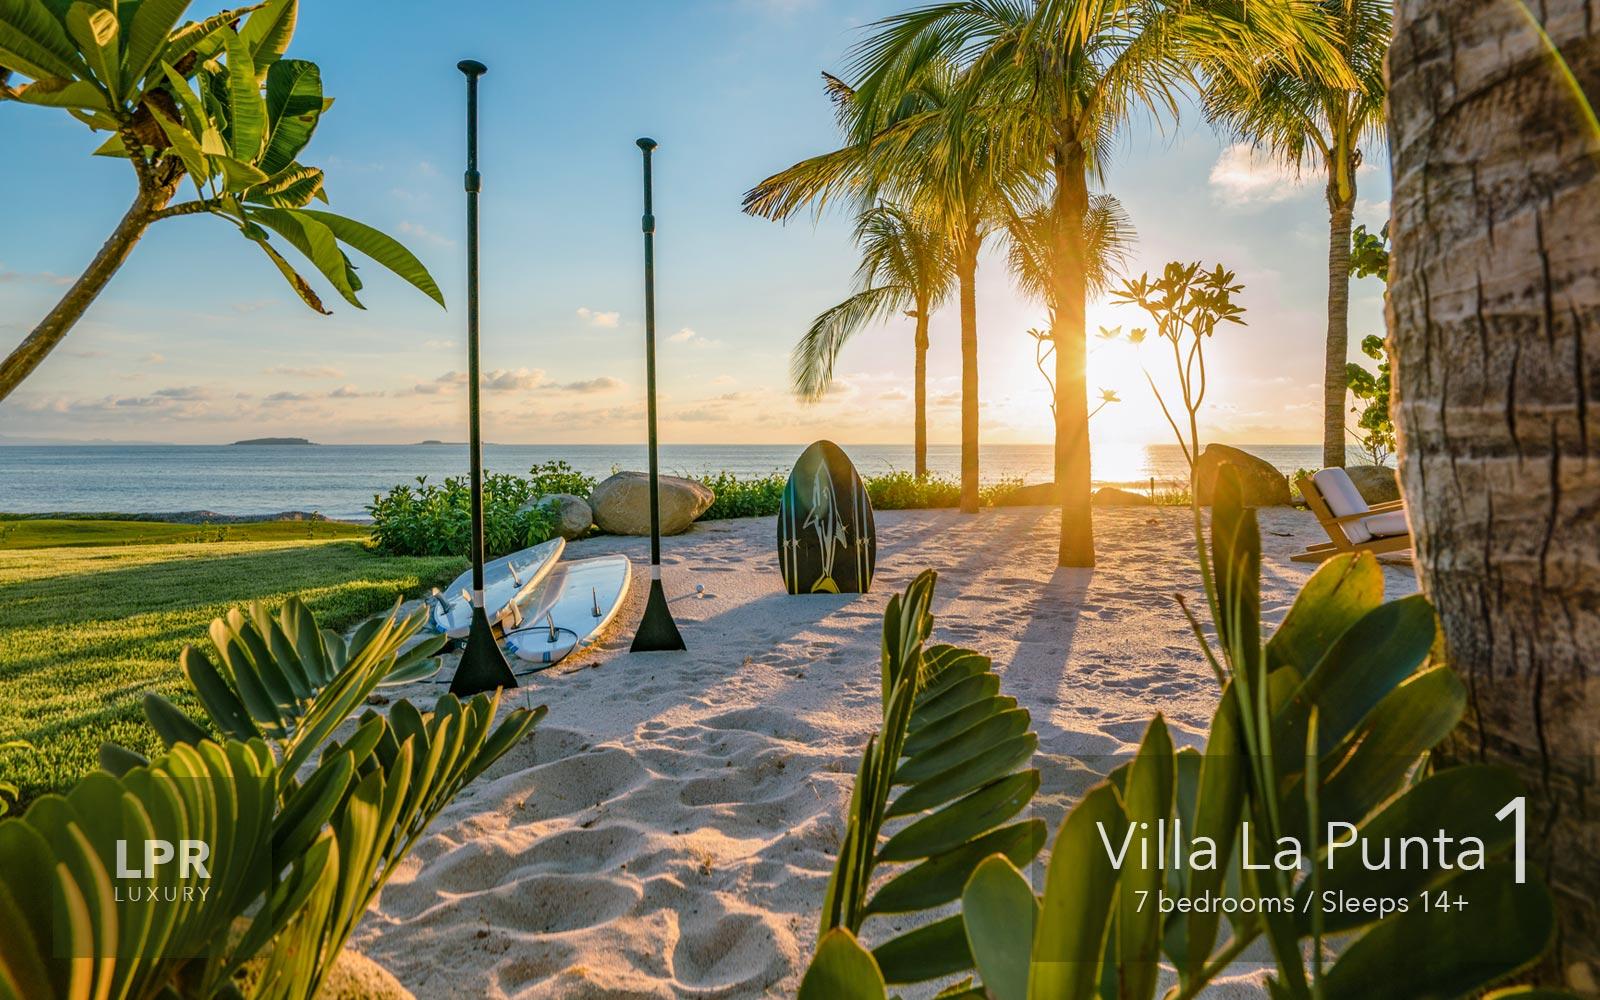 Villa La Punta 1 - Punta Mita Resort Ultra Luxury Vacation Villa rentals in Riviera Nayarit, Mexico